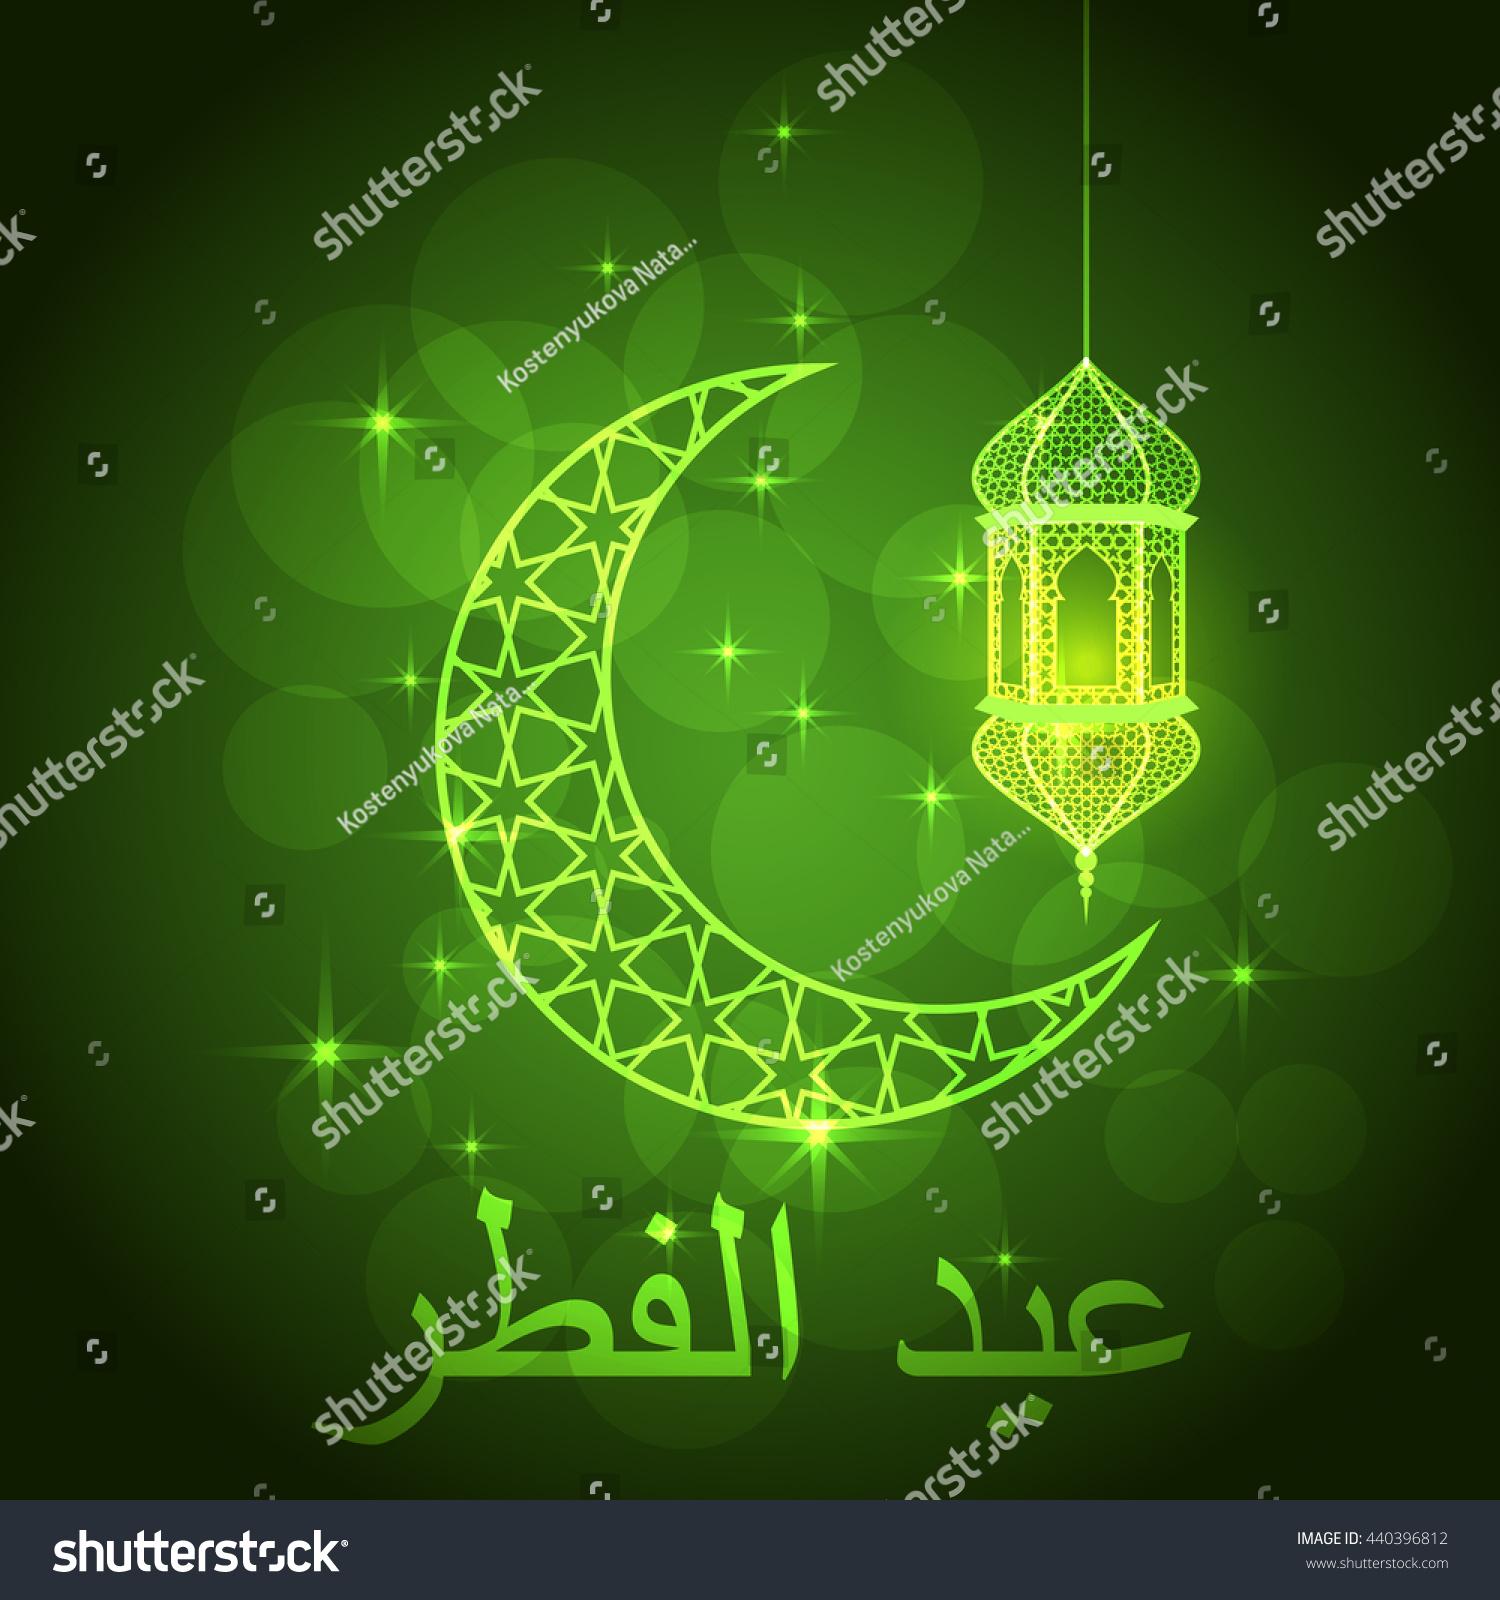 Popular Official Eid Al-Fitr Greeting - stock-vector-eid-al-fitr-greeting-card-on-green-background-vector-illustration-eid-al-fitr-means-festival-of-440396812  Pic_306522 .jpg